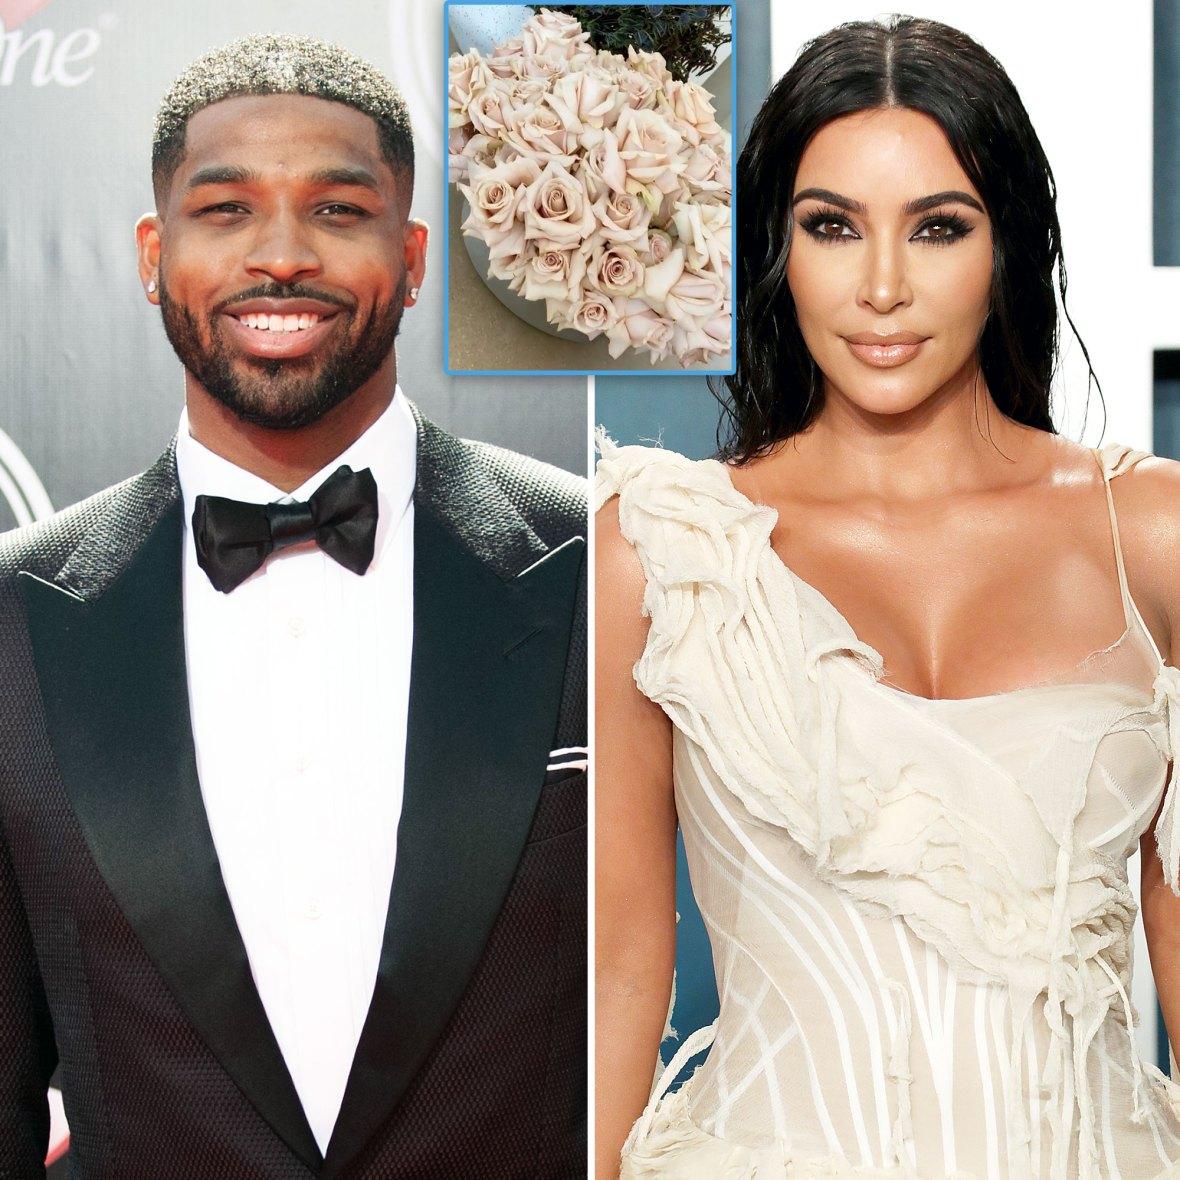 Tristan Thompson Sends Flowers to Kim Kardashian Ahead of Mothers Day